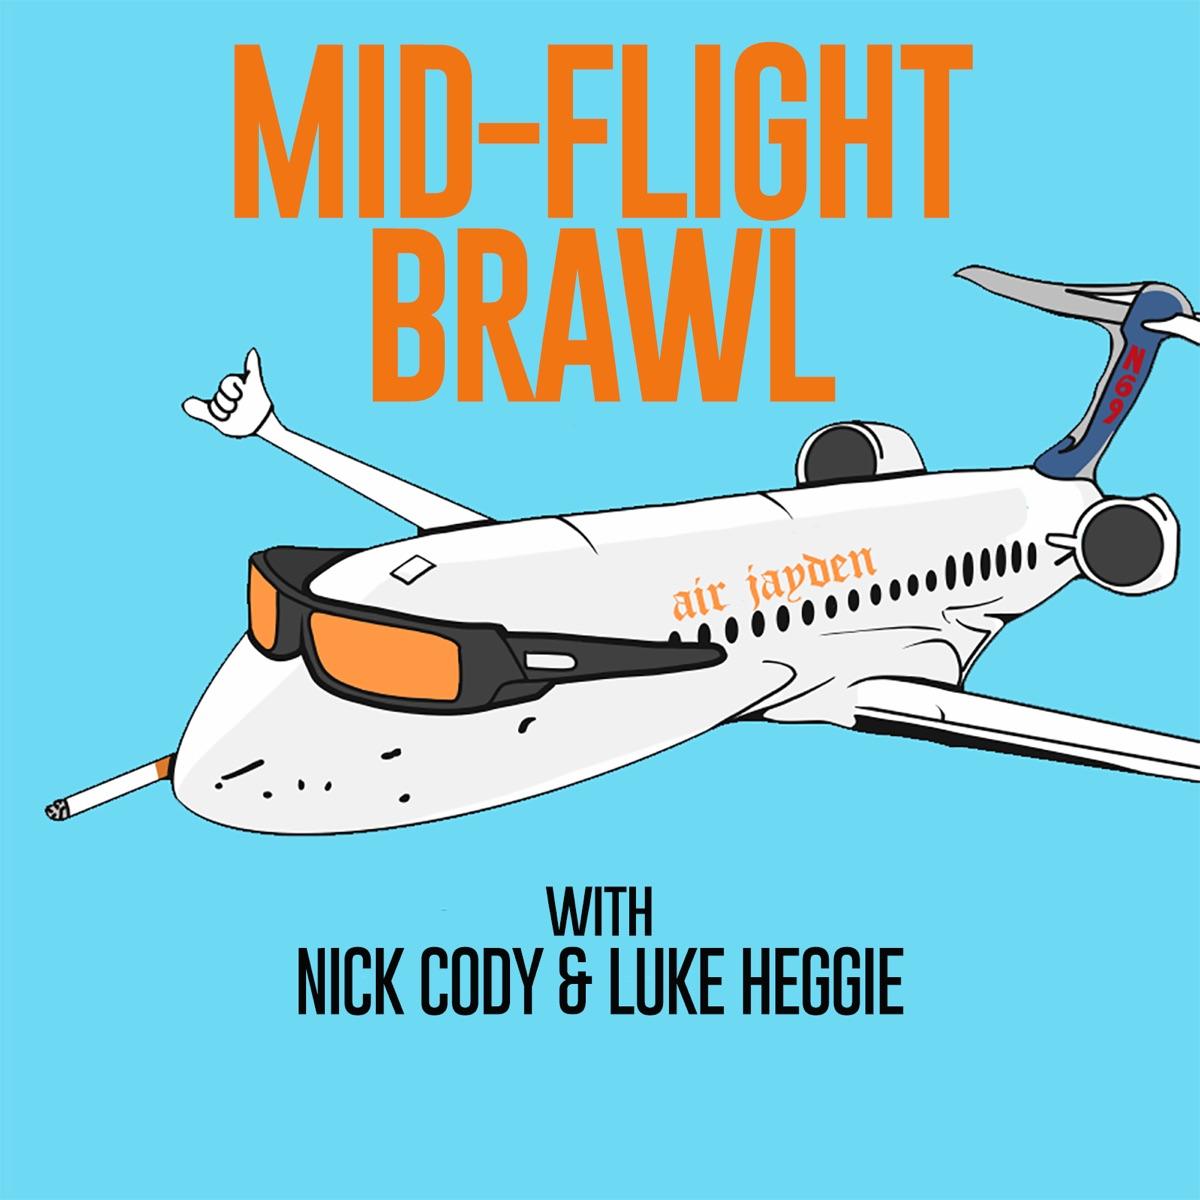 Mid Flight Brawl